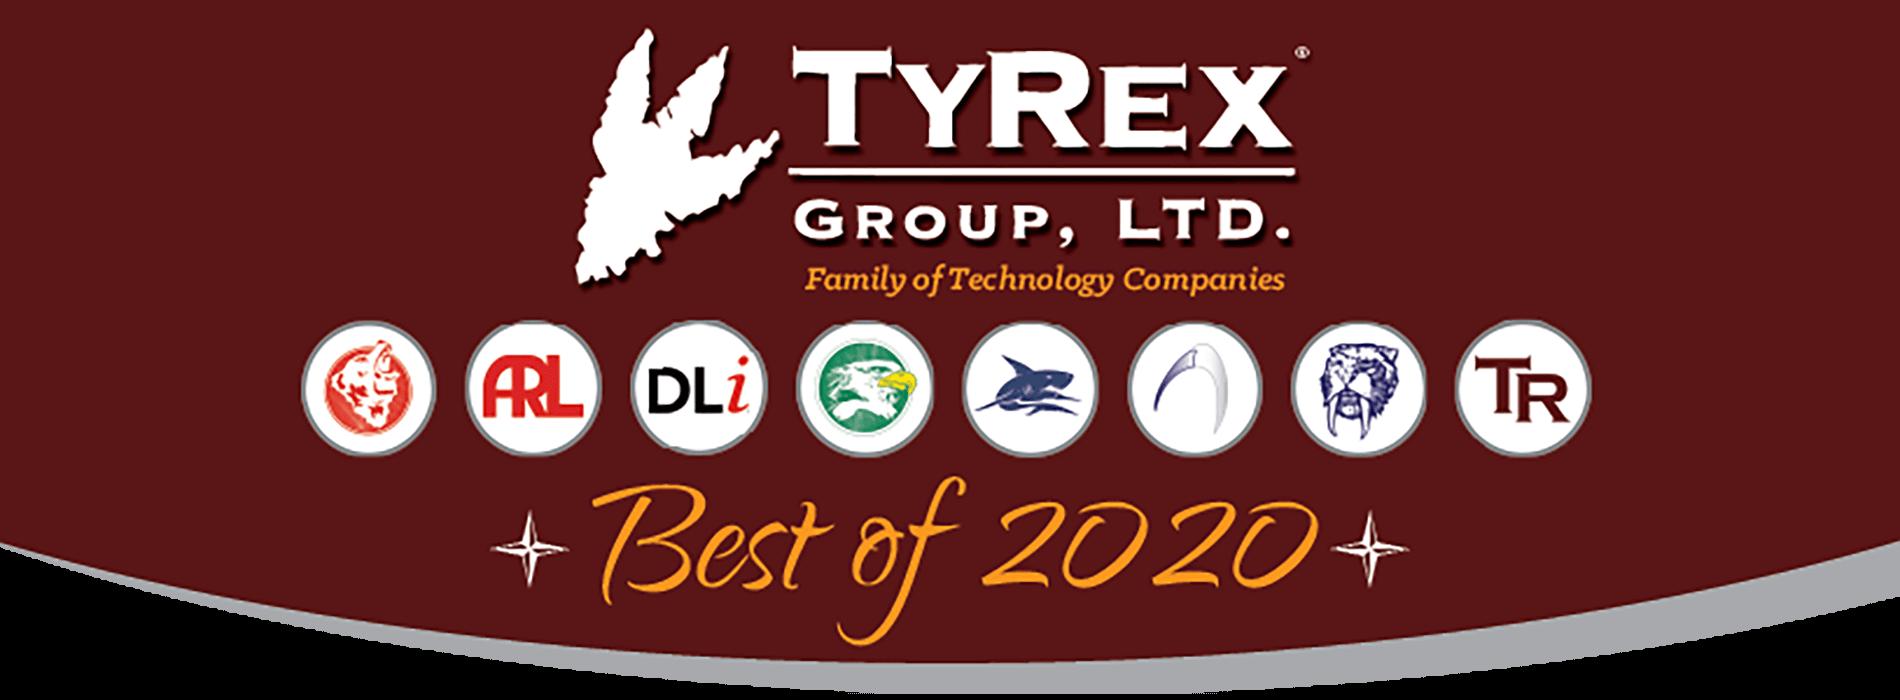 TyRex Technology Family Best of 2020